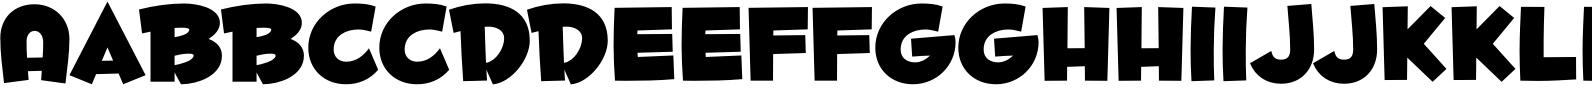 Fontdinerdotcom Huggable